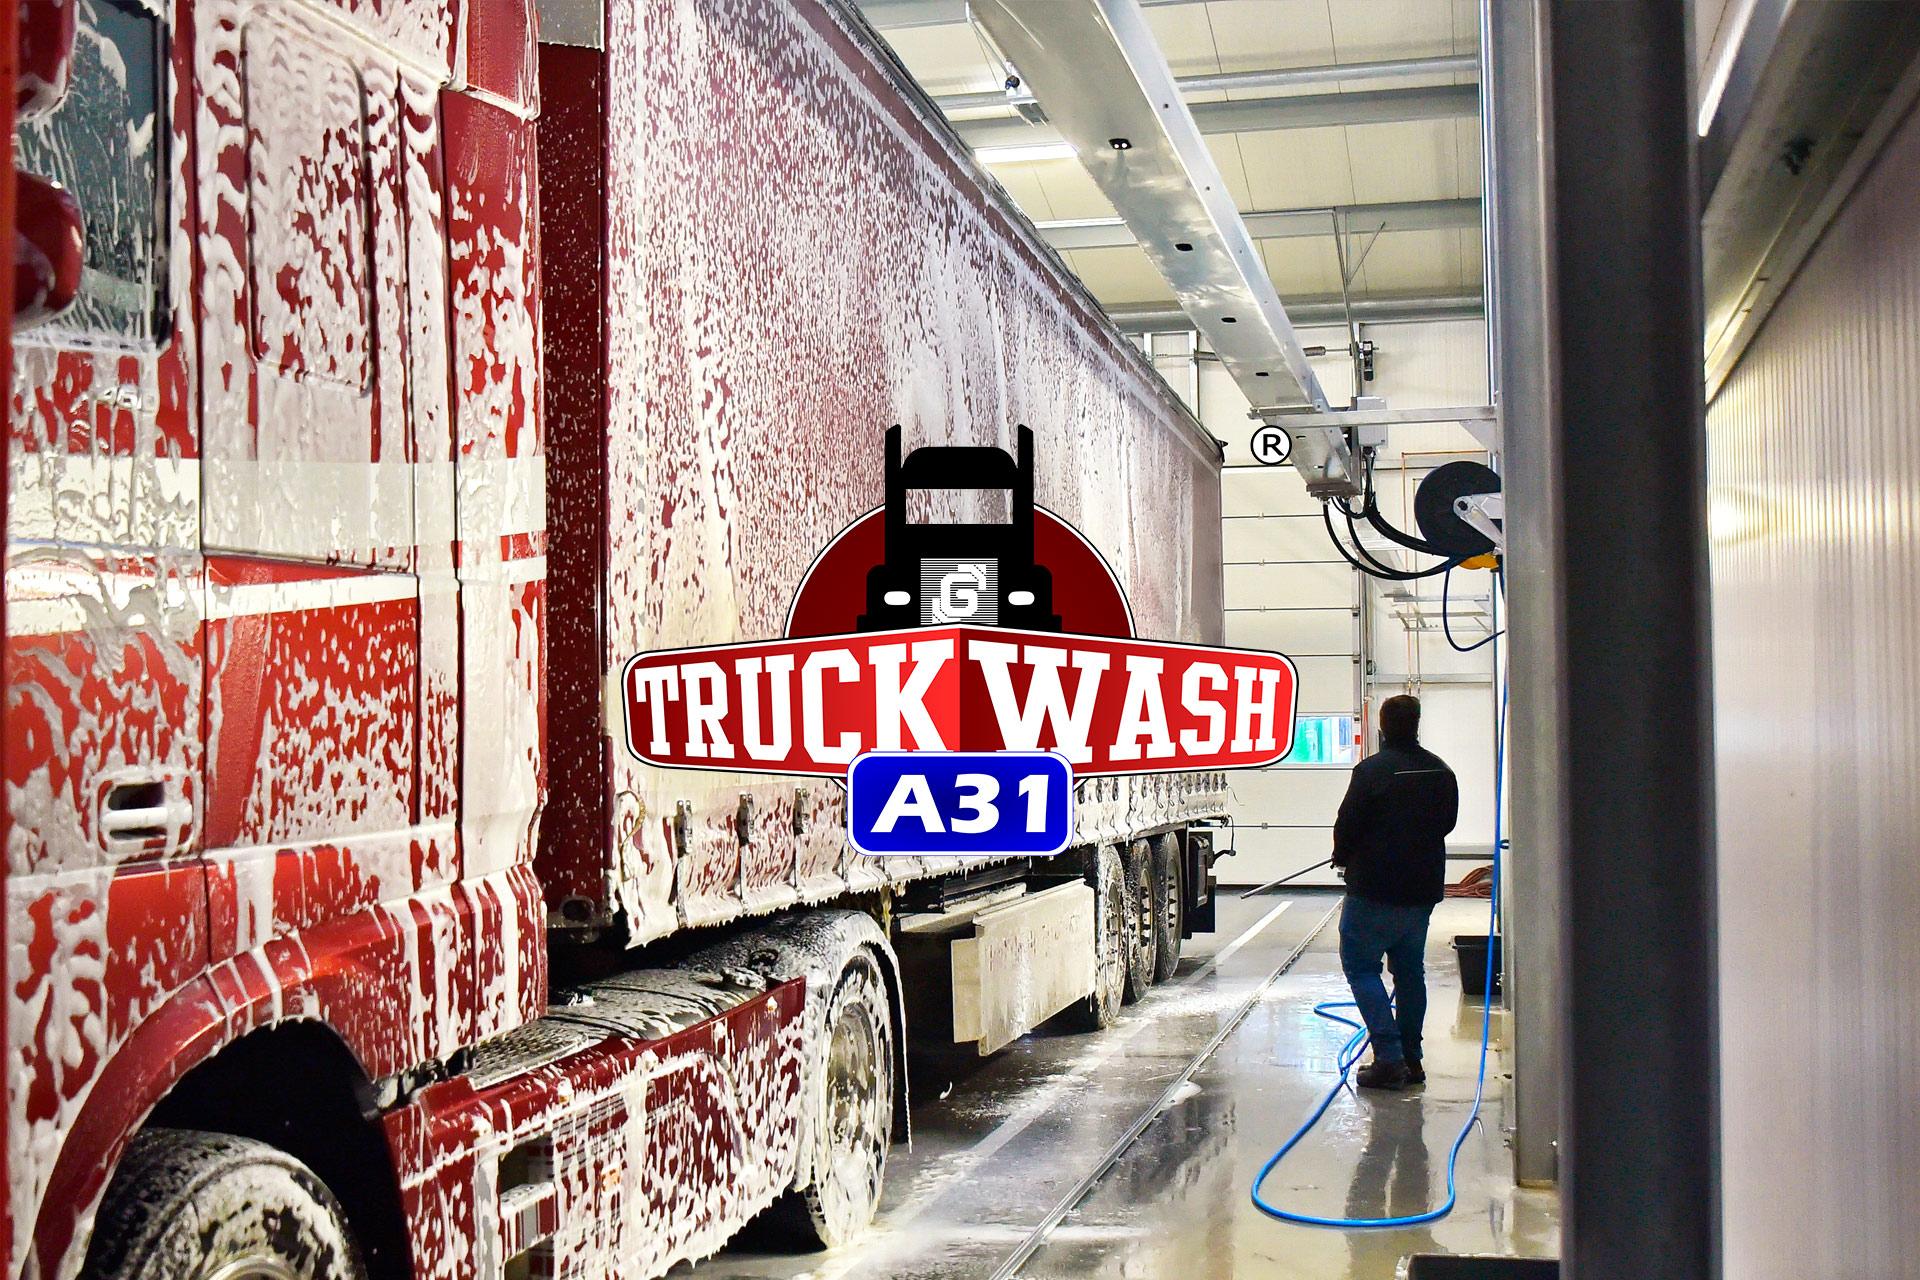 TruckWashA31